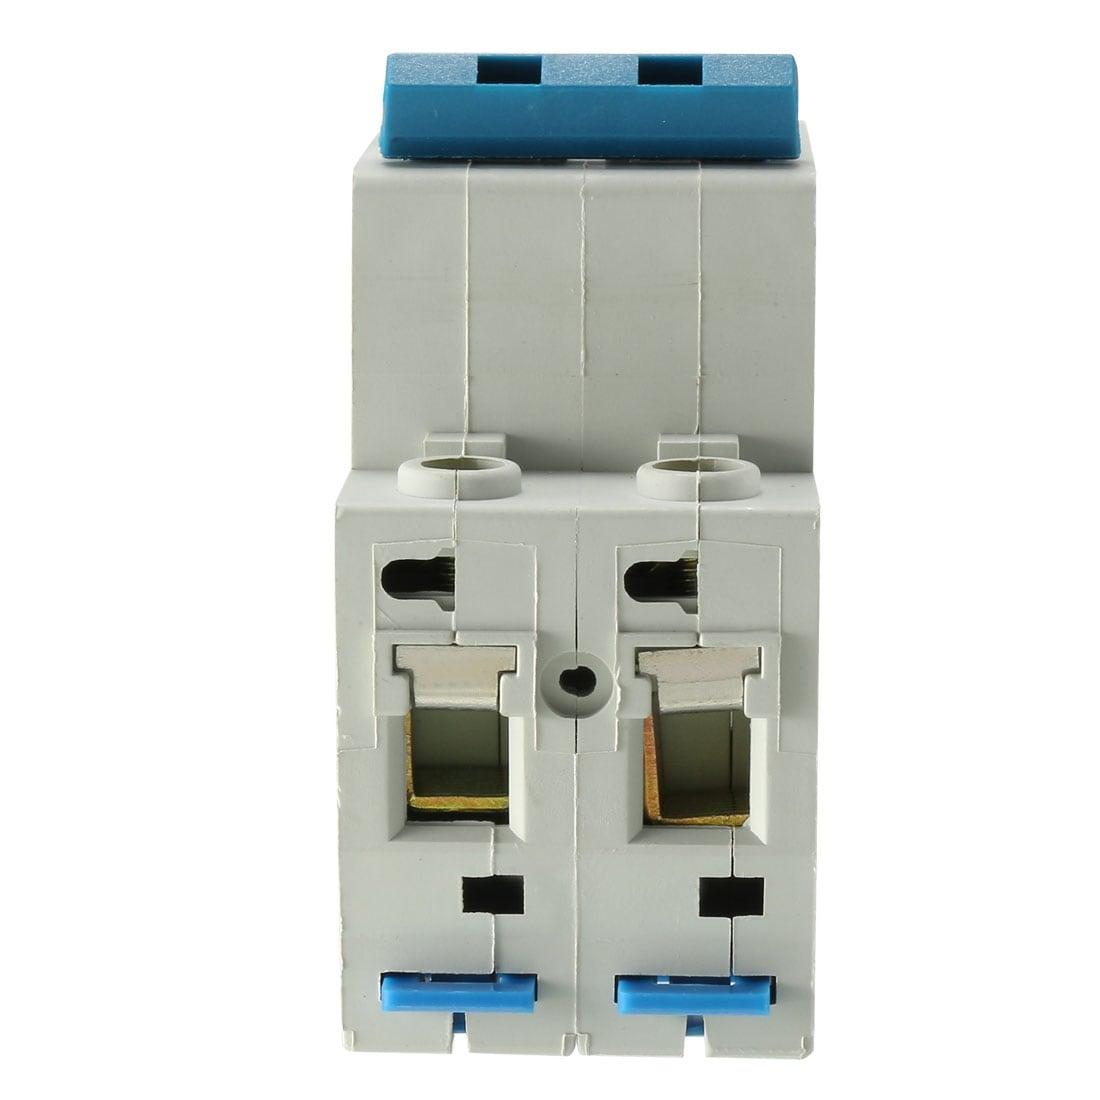 Short circuit Breaker Dz47-63 10-63A 2p AC 400V Breaker Switch Mini Overload